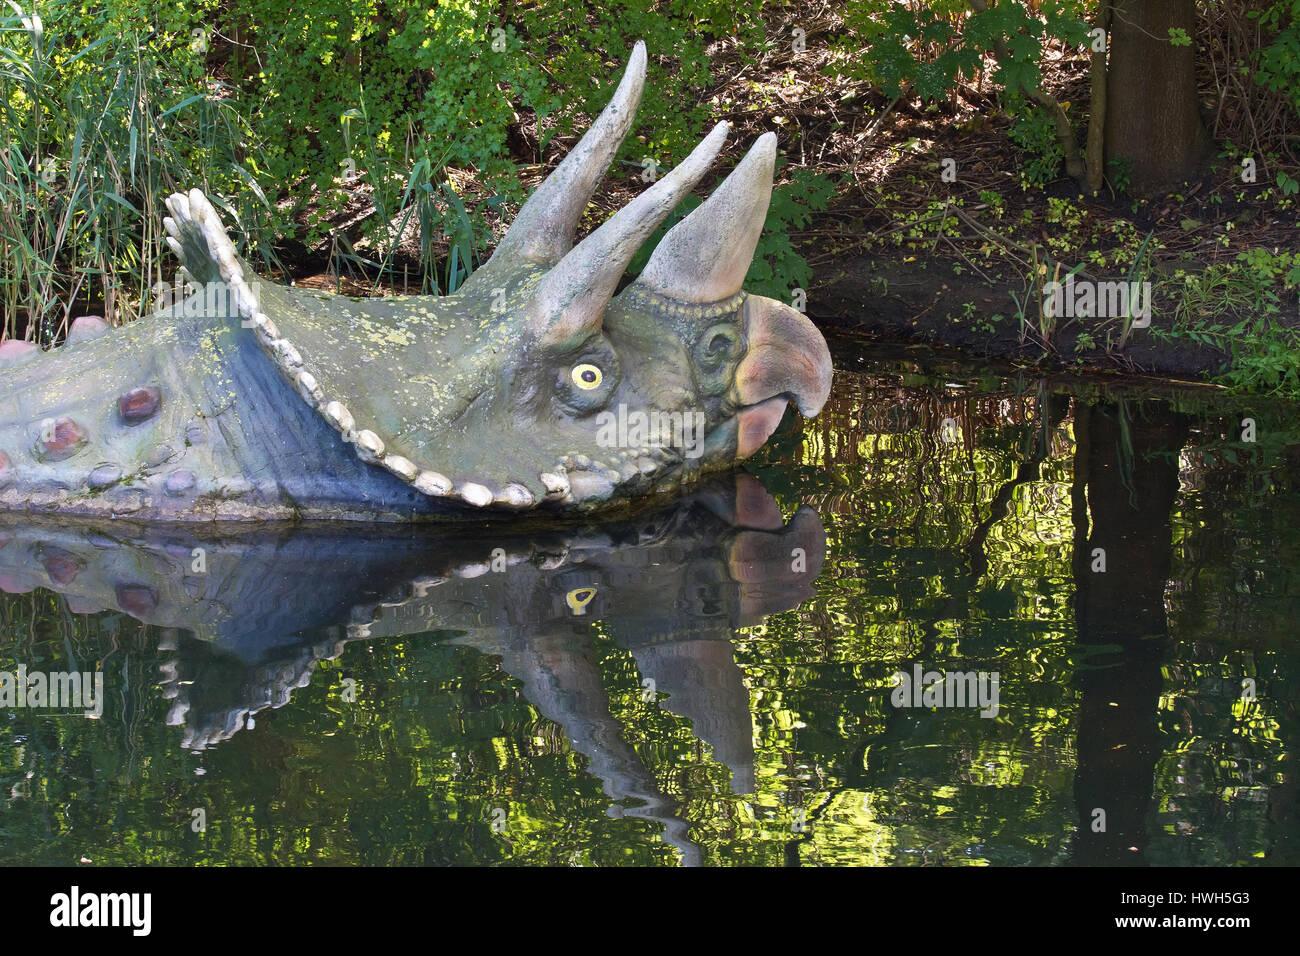 'Triceratops, Germany; Germany; Hamburg; Hagenbecks animal park; saurians; dinosaur; Triceratops; geology; geology; - Stock Image